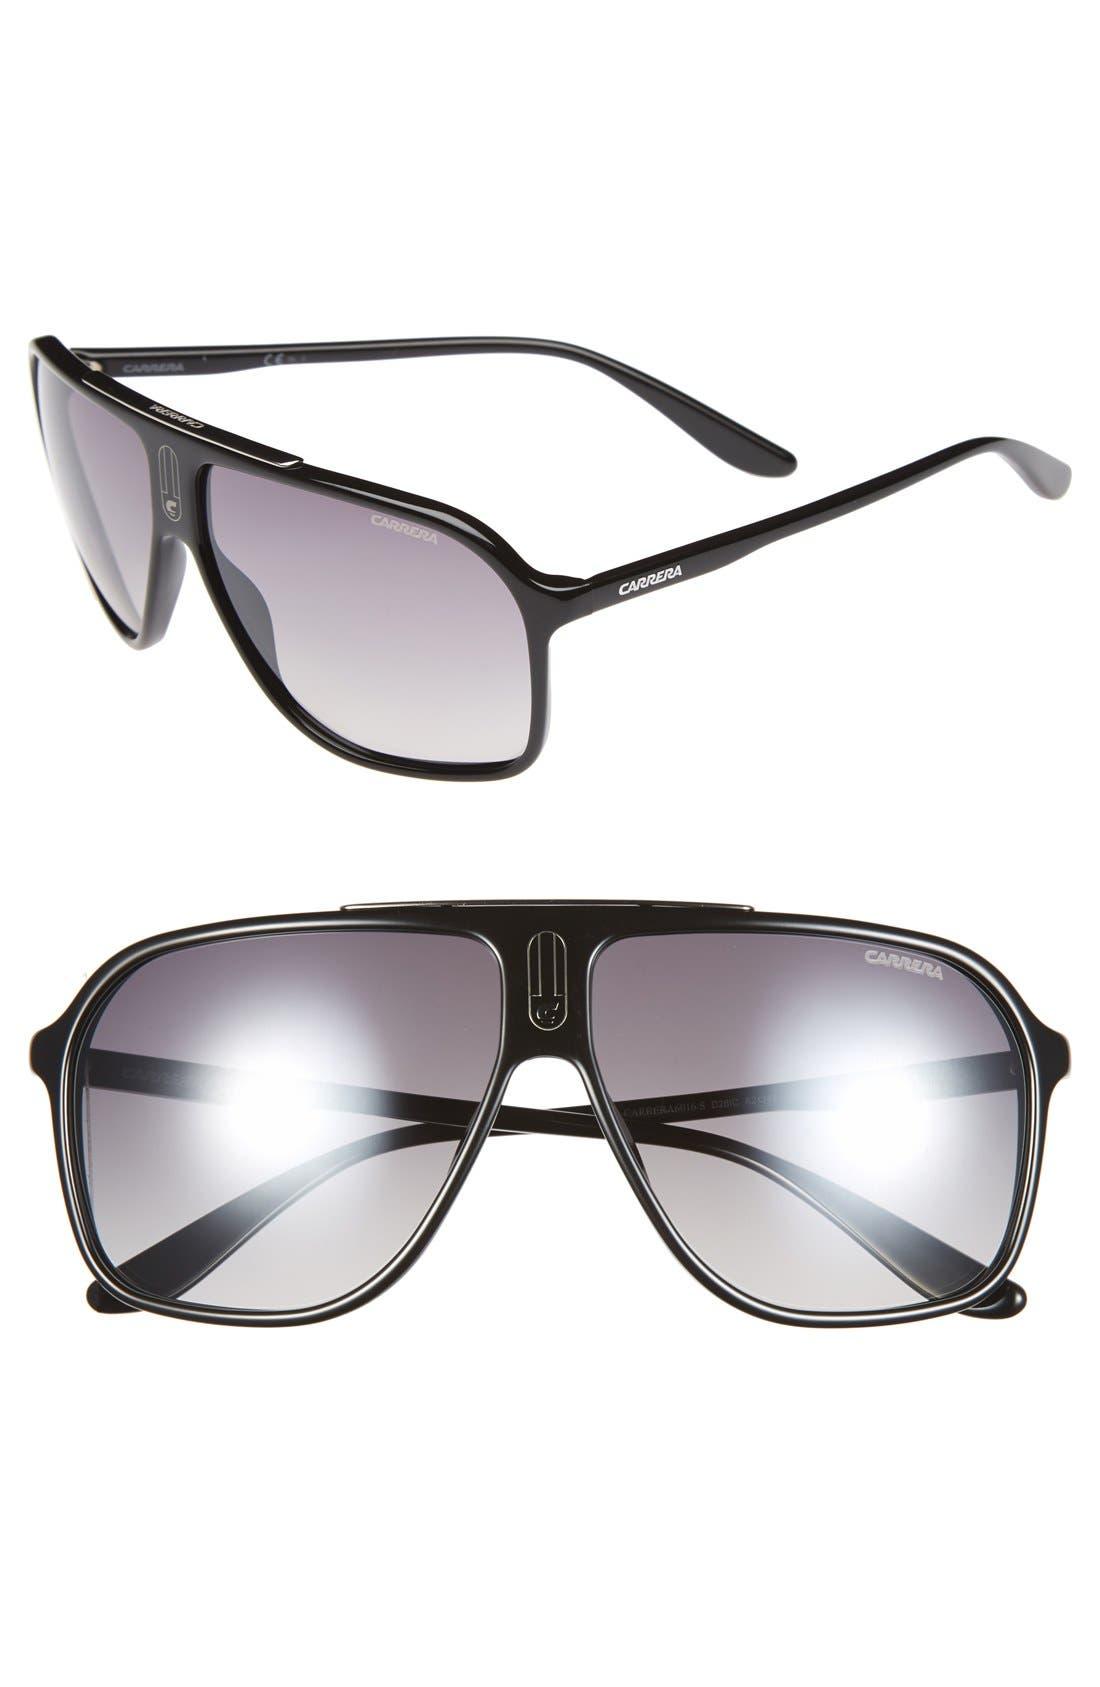 62mm Sunglasses,                             Main thumbnail 1, color,                             001